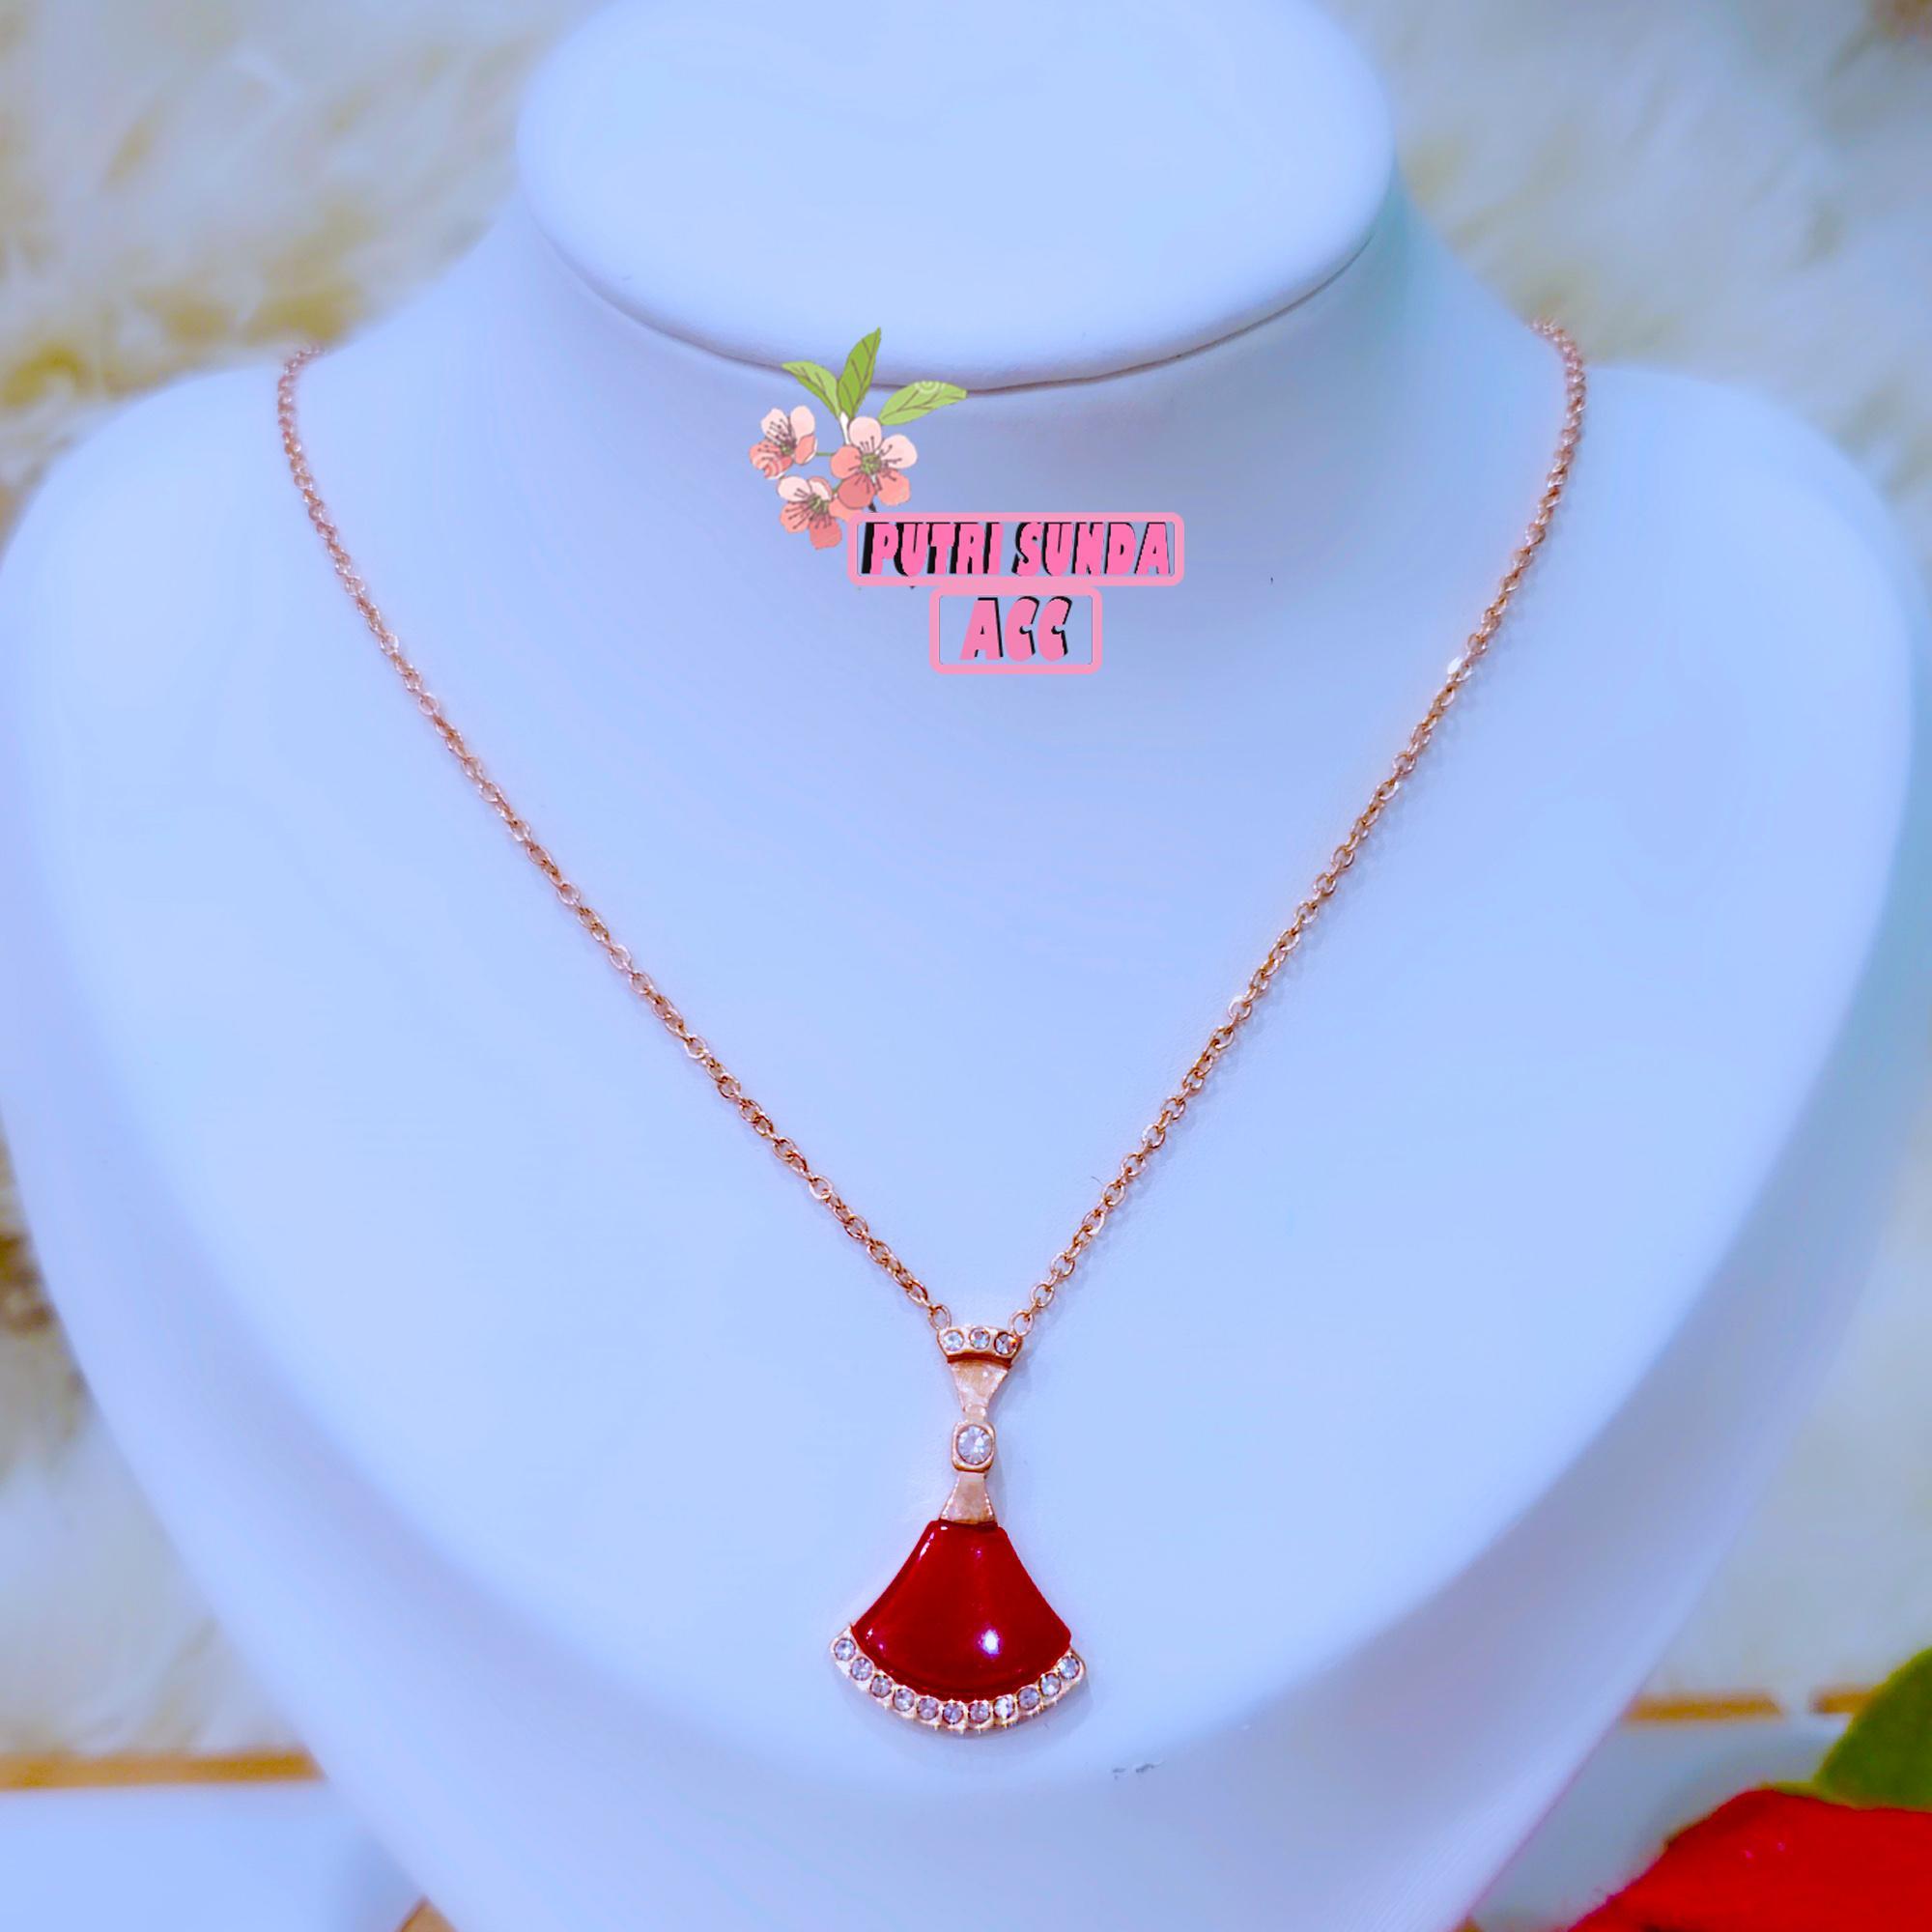 kalung titanium wanita  berkualitas import cantik menawan daily motif merah delima kipas garis permata kekinian – rose gold